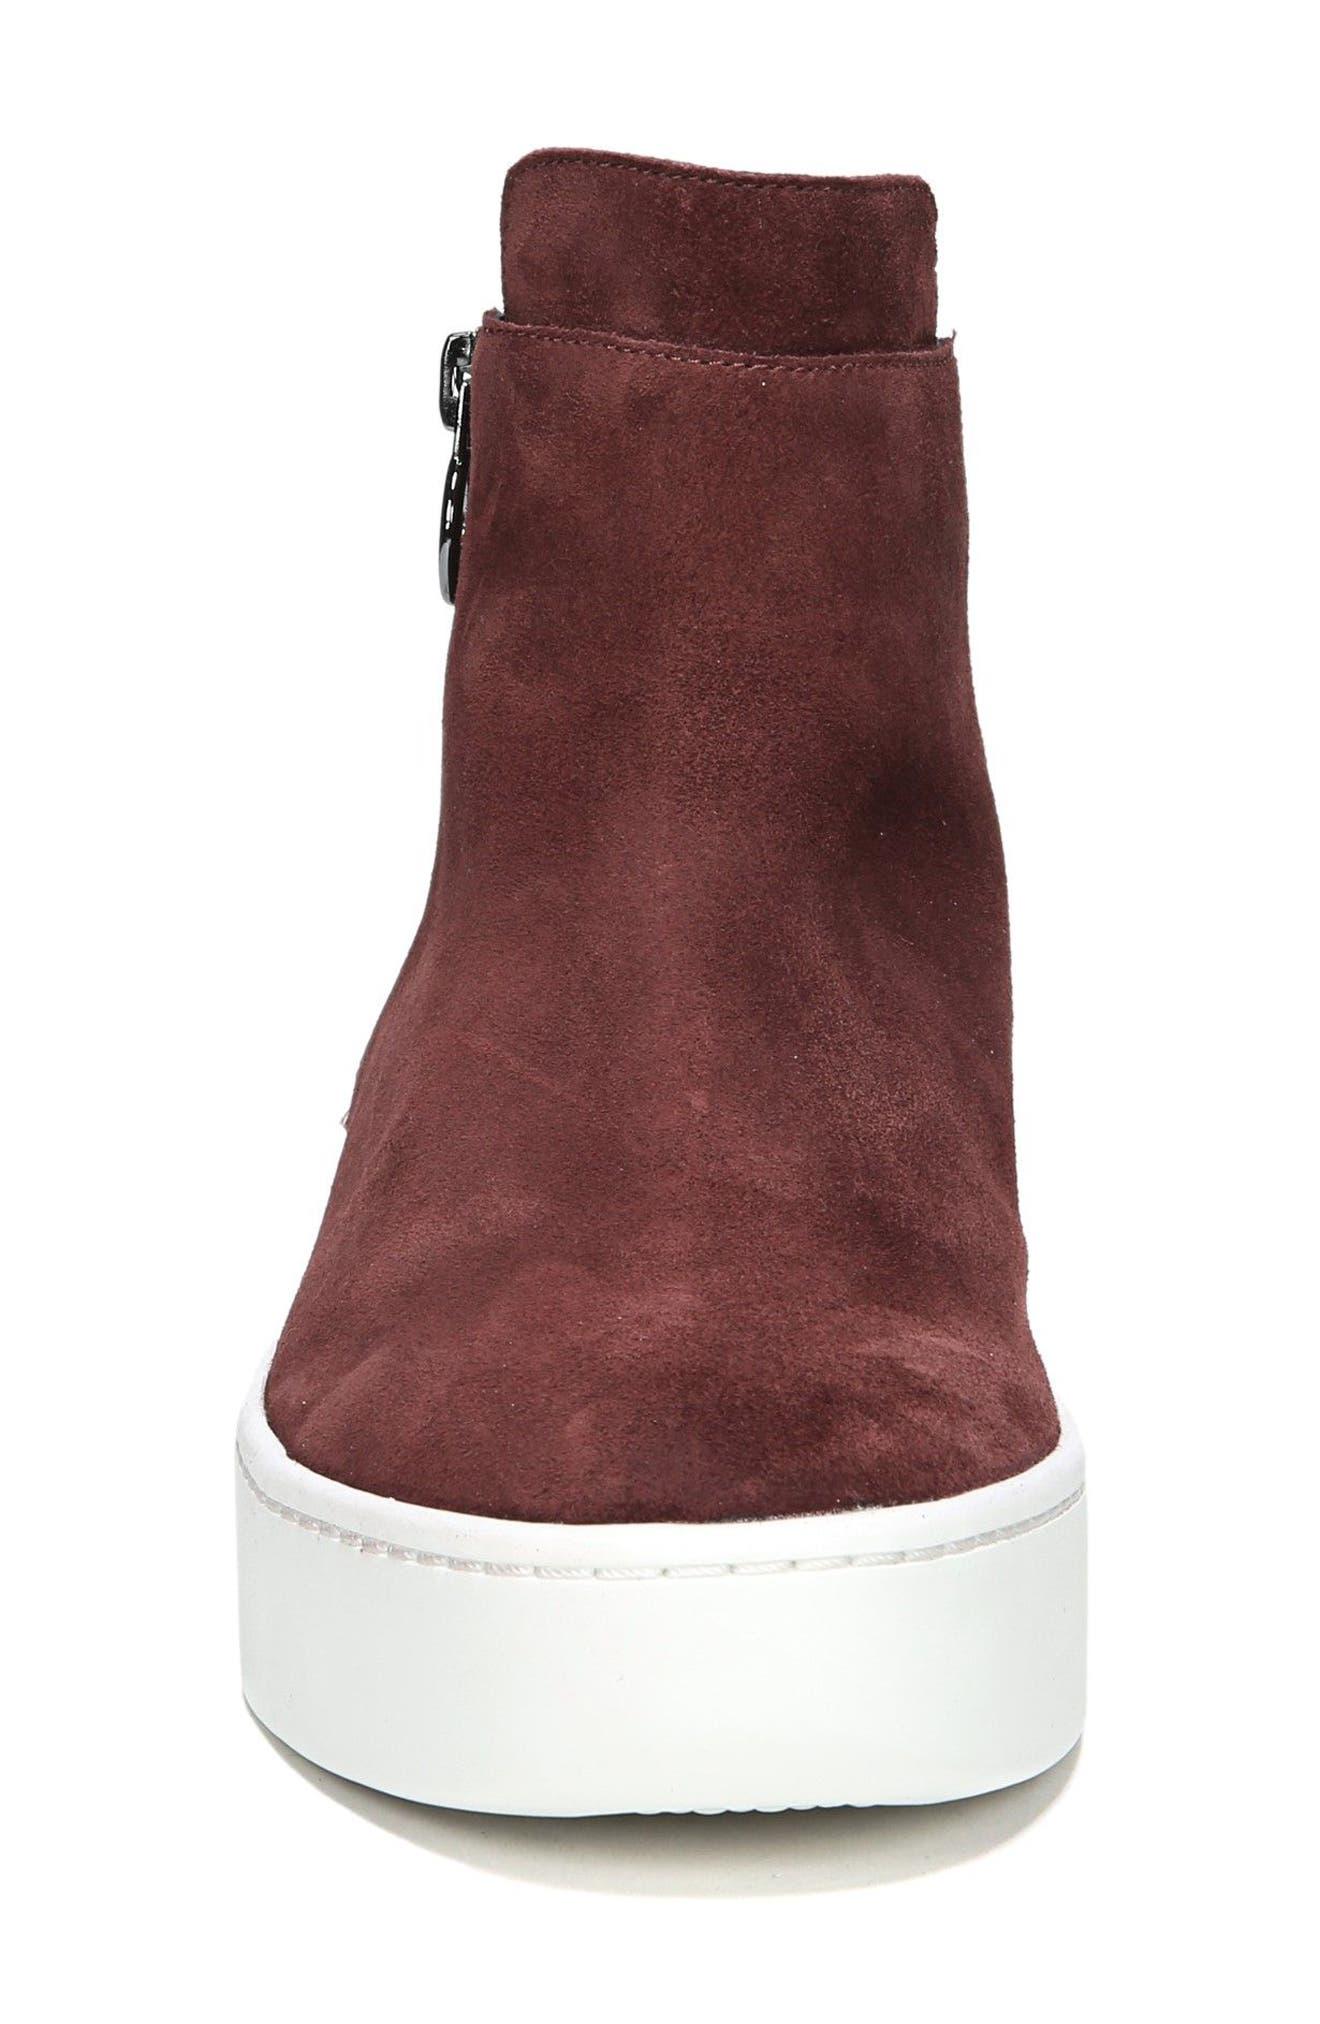 Easton High Top Sneaker,                             Alternate thumbnail 12, color,